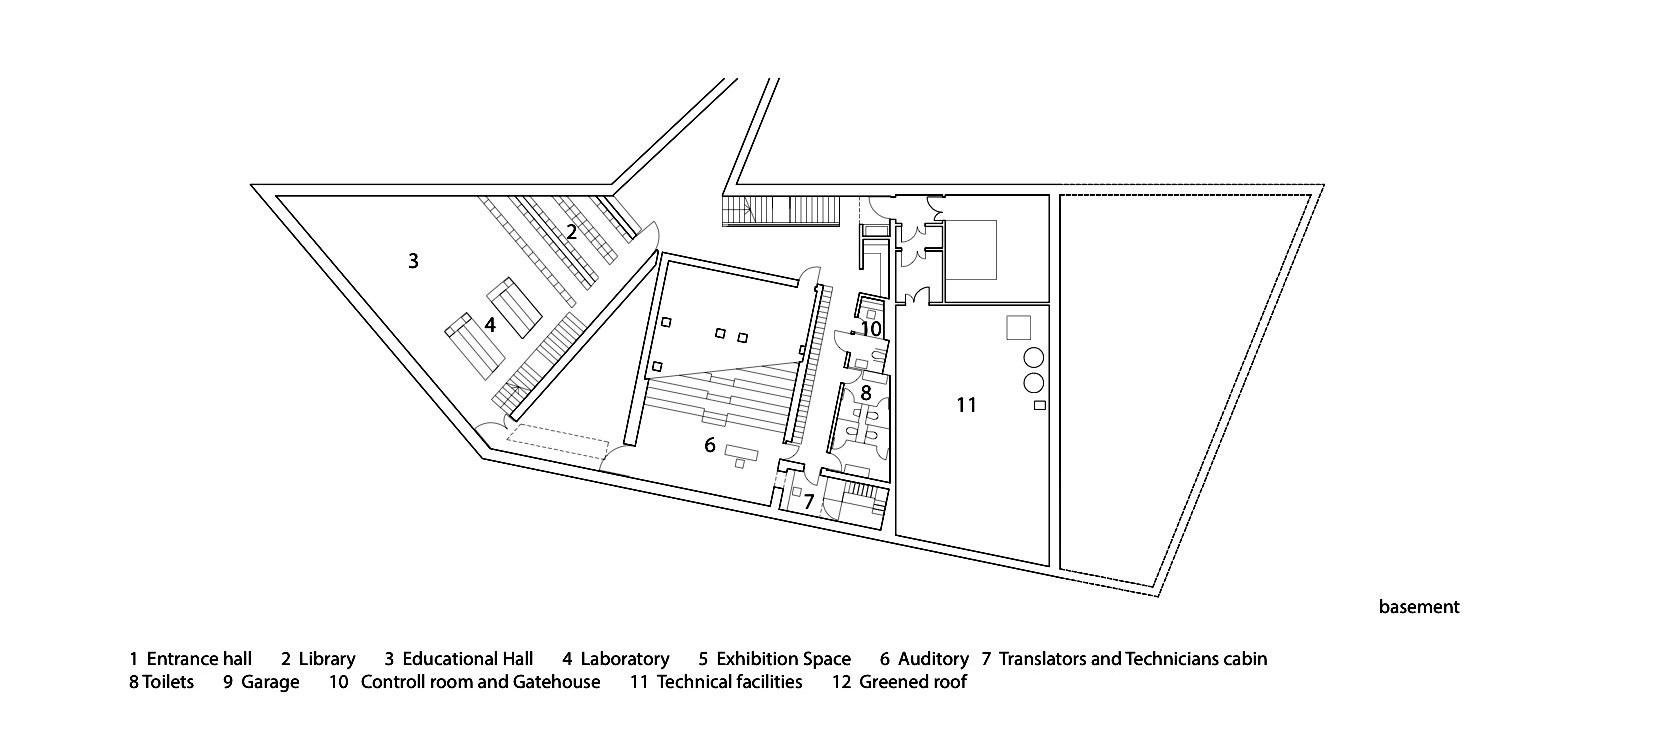 Basement_Floor_Plan.jpg